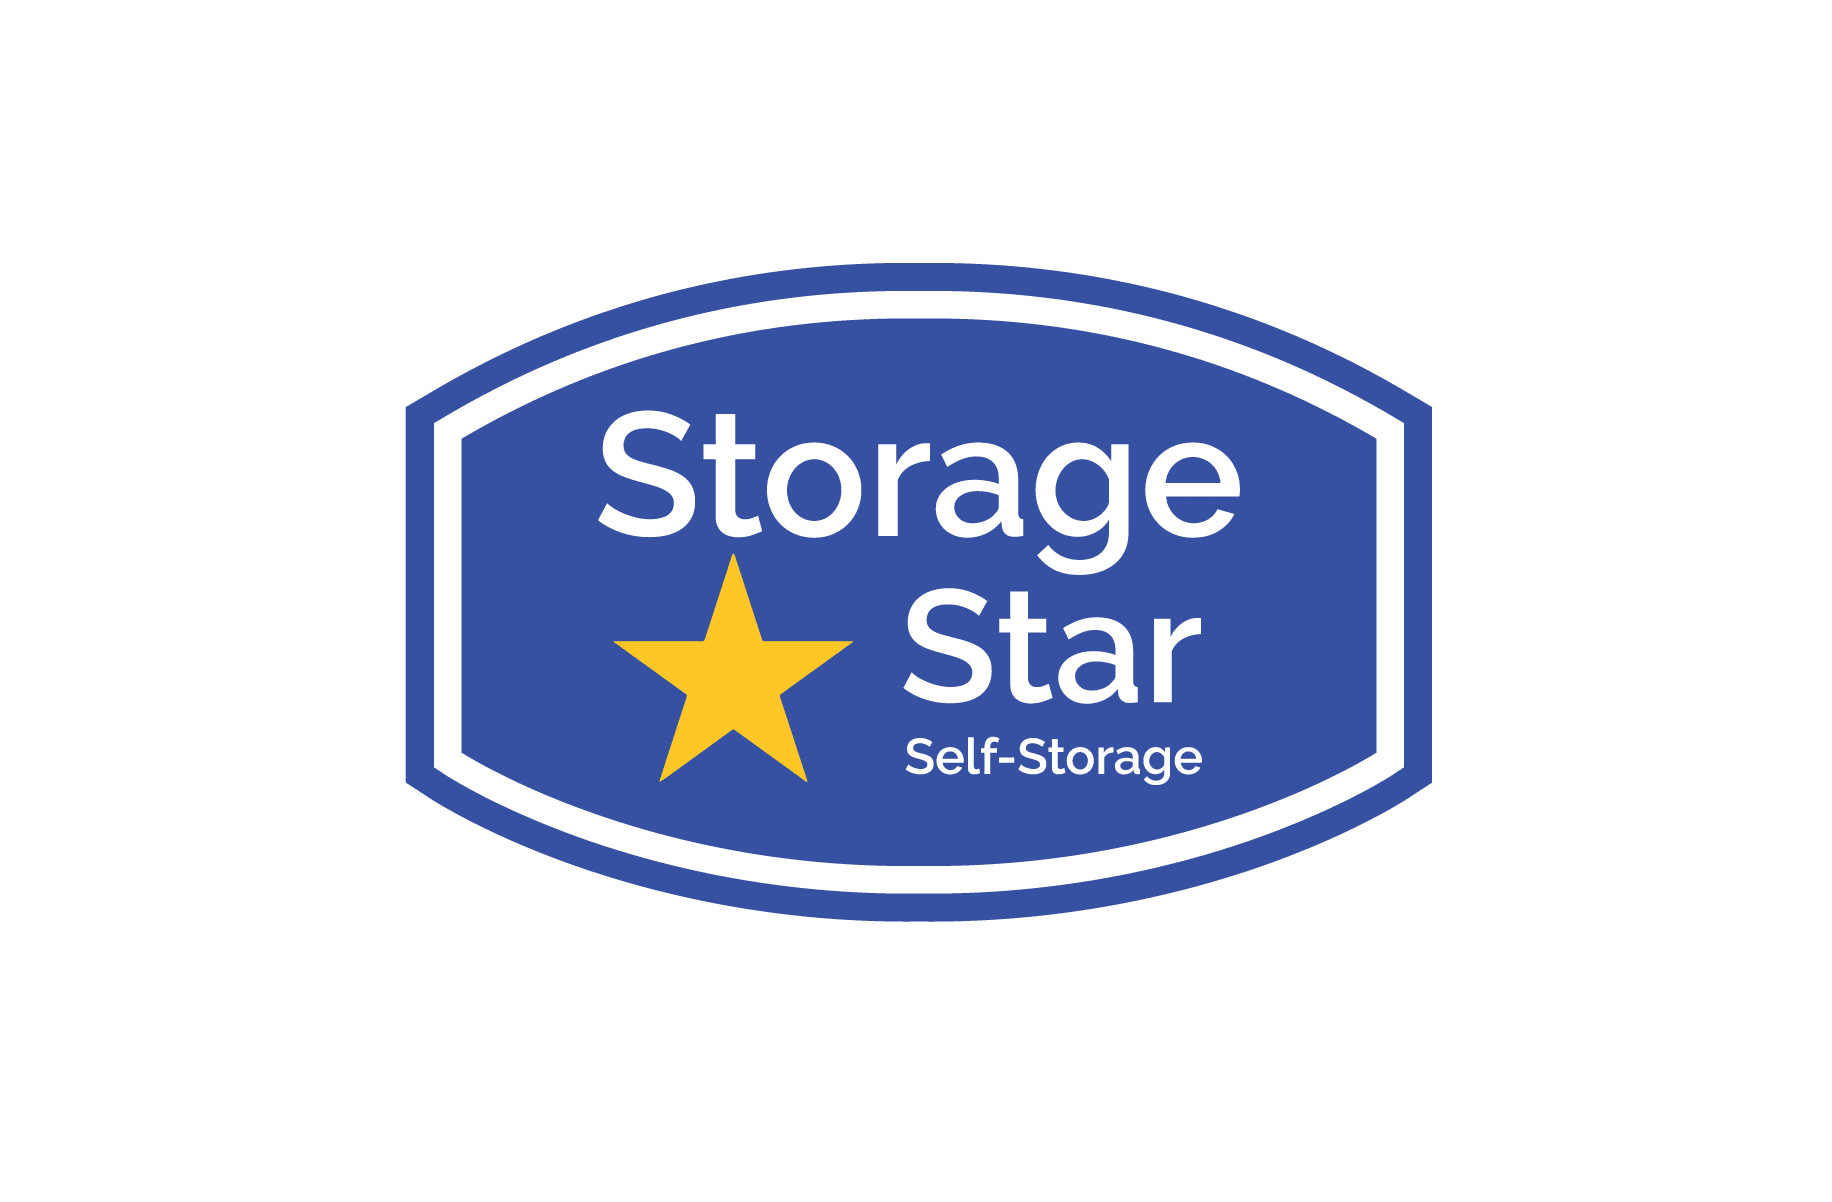 Storage Star East Sac in Sacramento, California logo